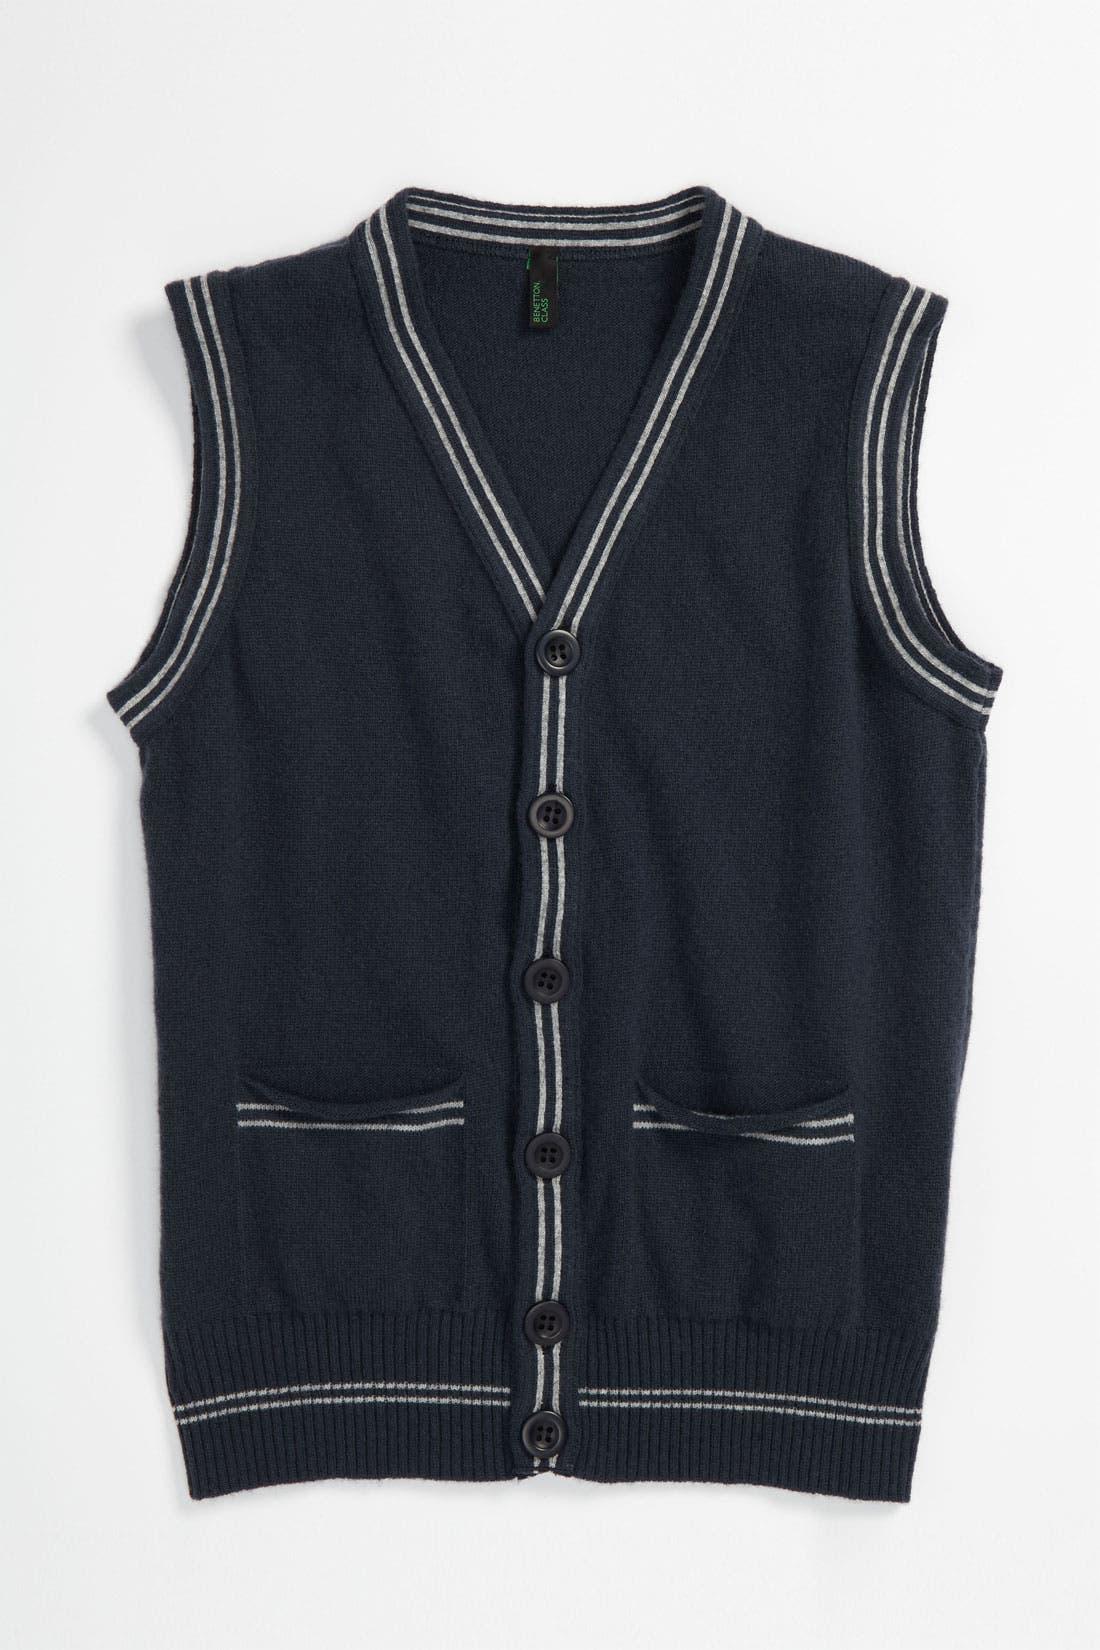 Main Image - United Colors of Benetton Kids Sweater Vest (Little Boys & Big Boys)